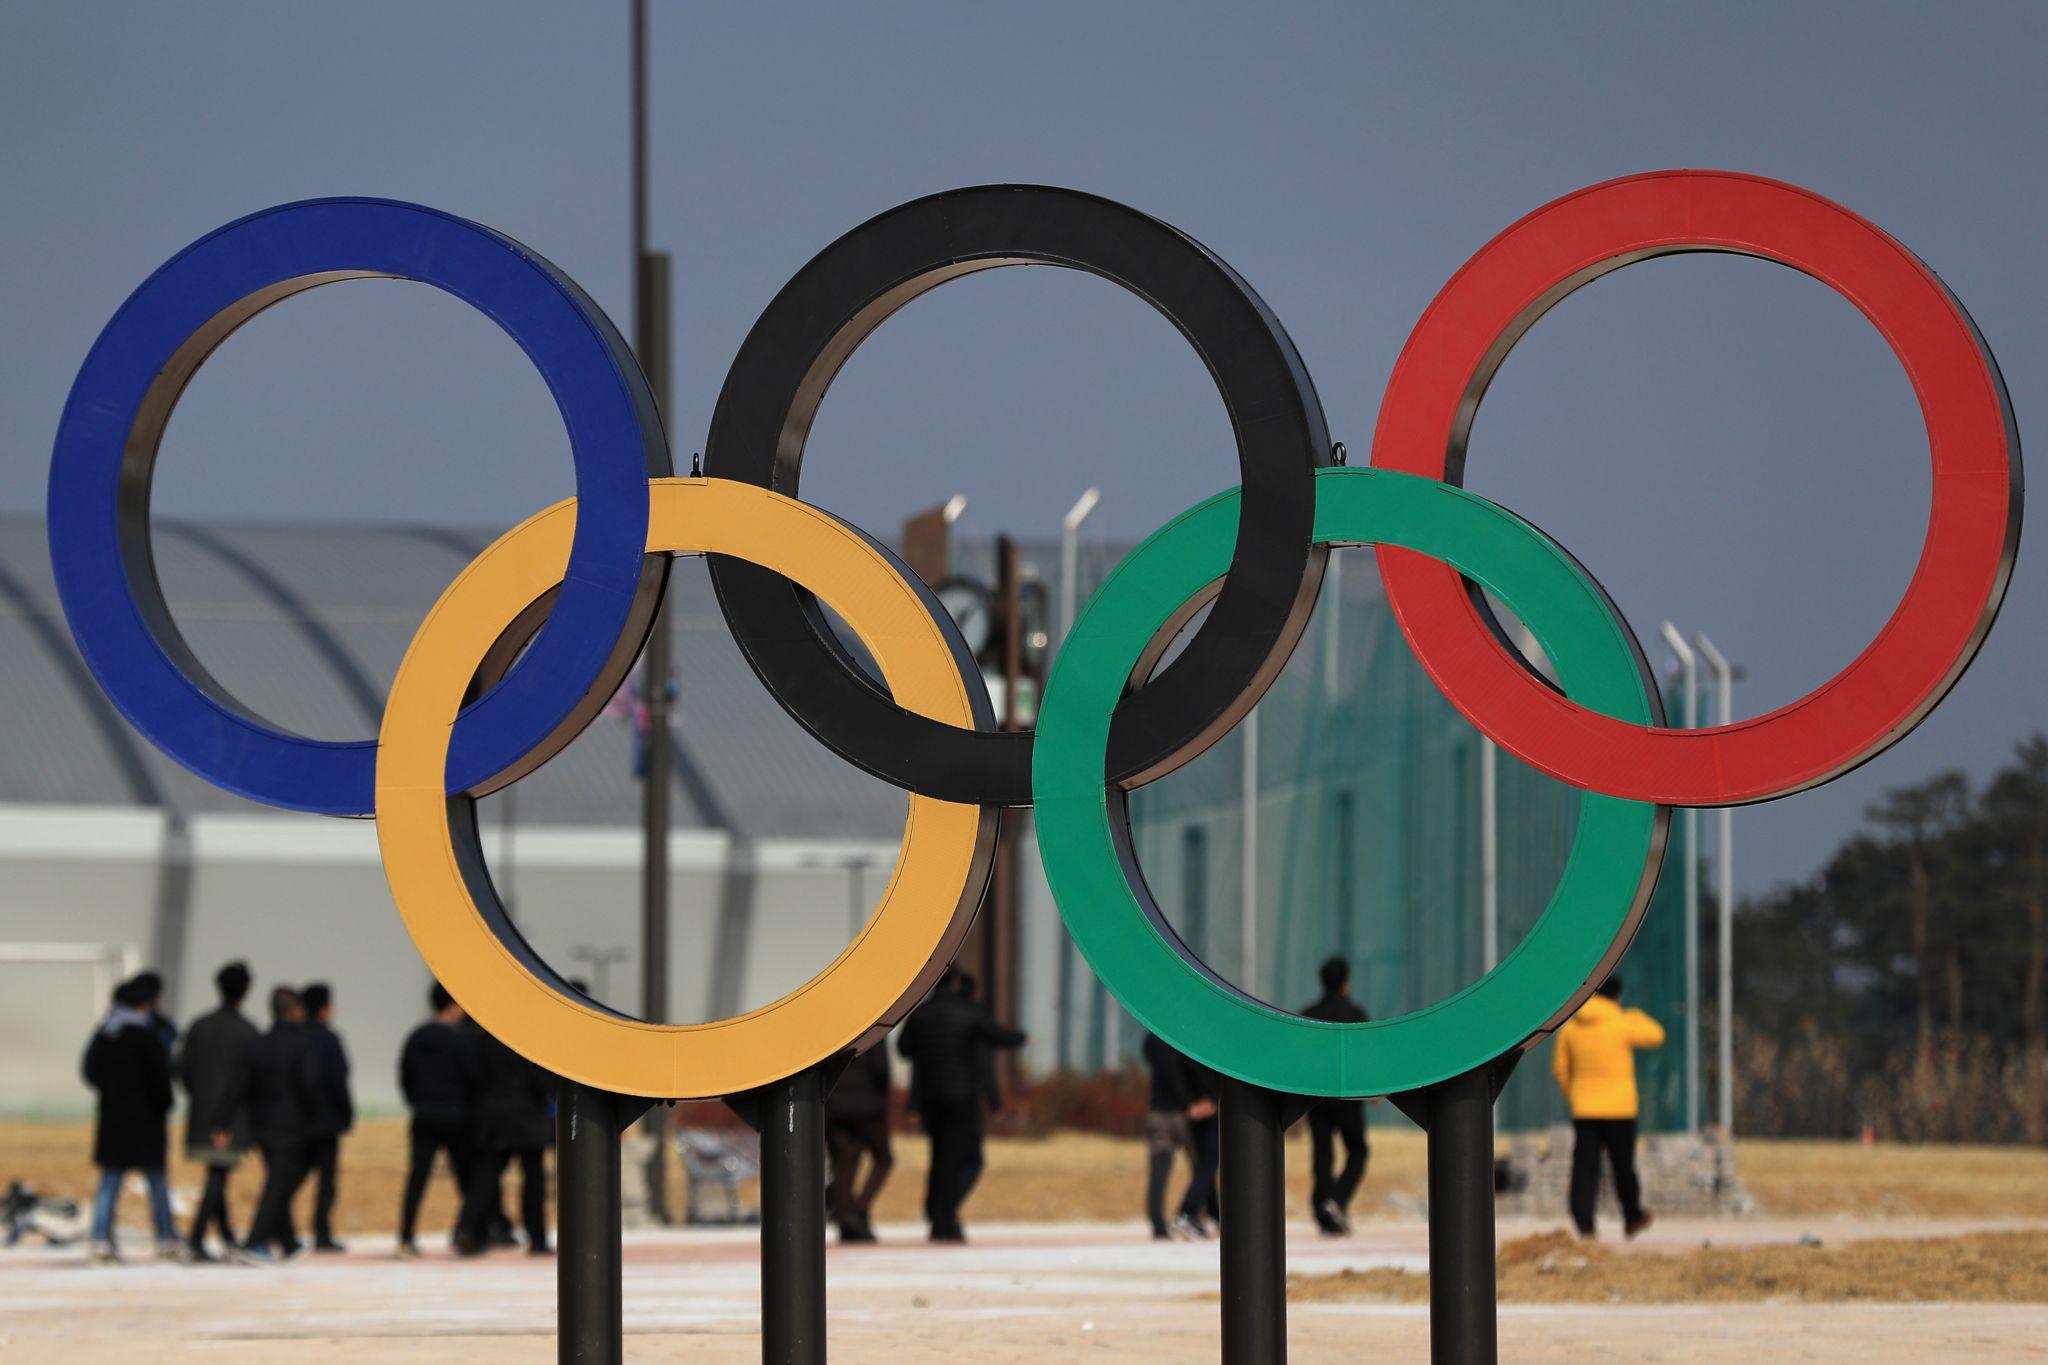 Street scene near the Gangneun Coastal Cluster, host of the Pyeongchang 2018 Winter Games